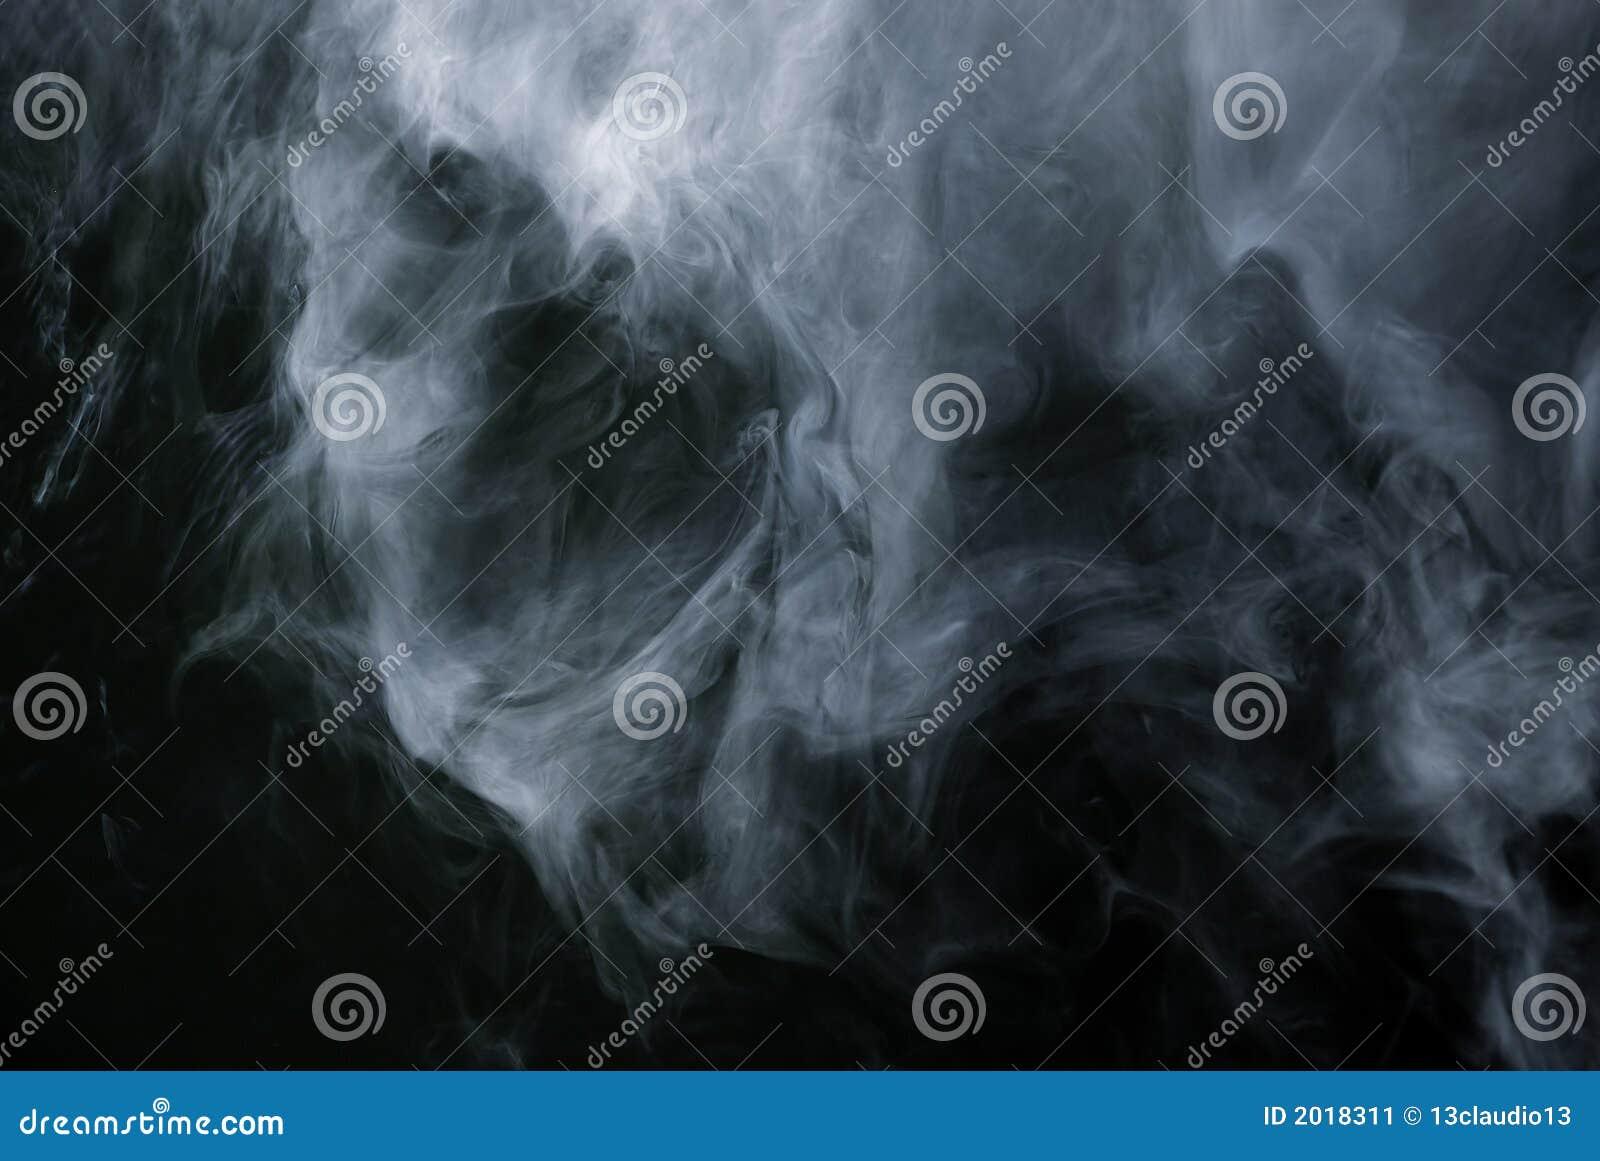 Duch czaszki